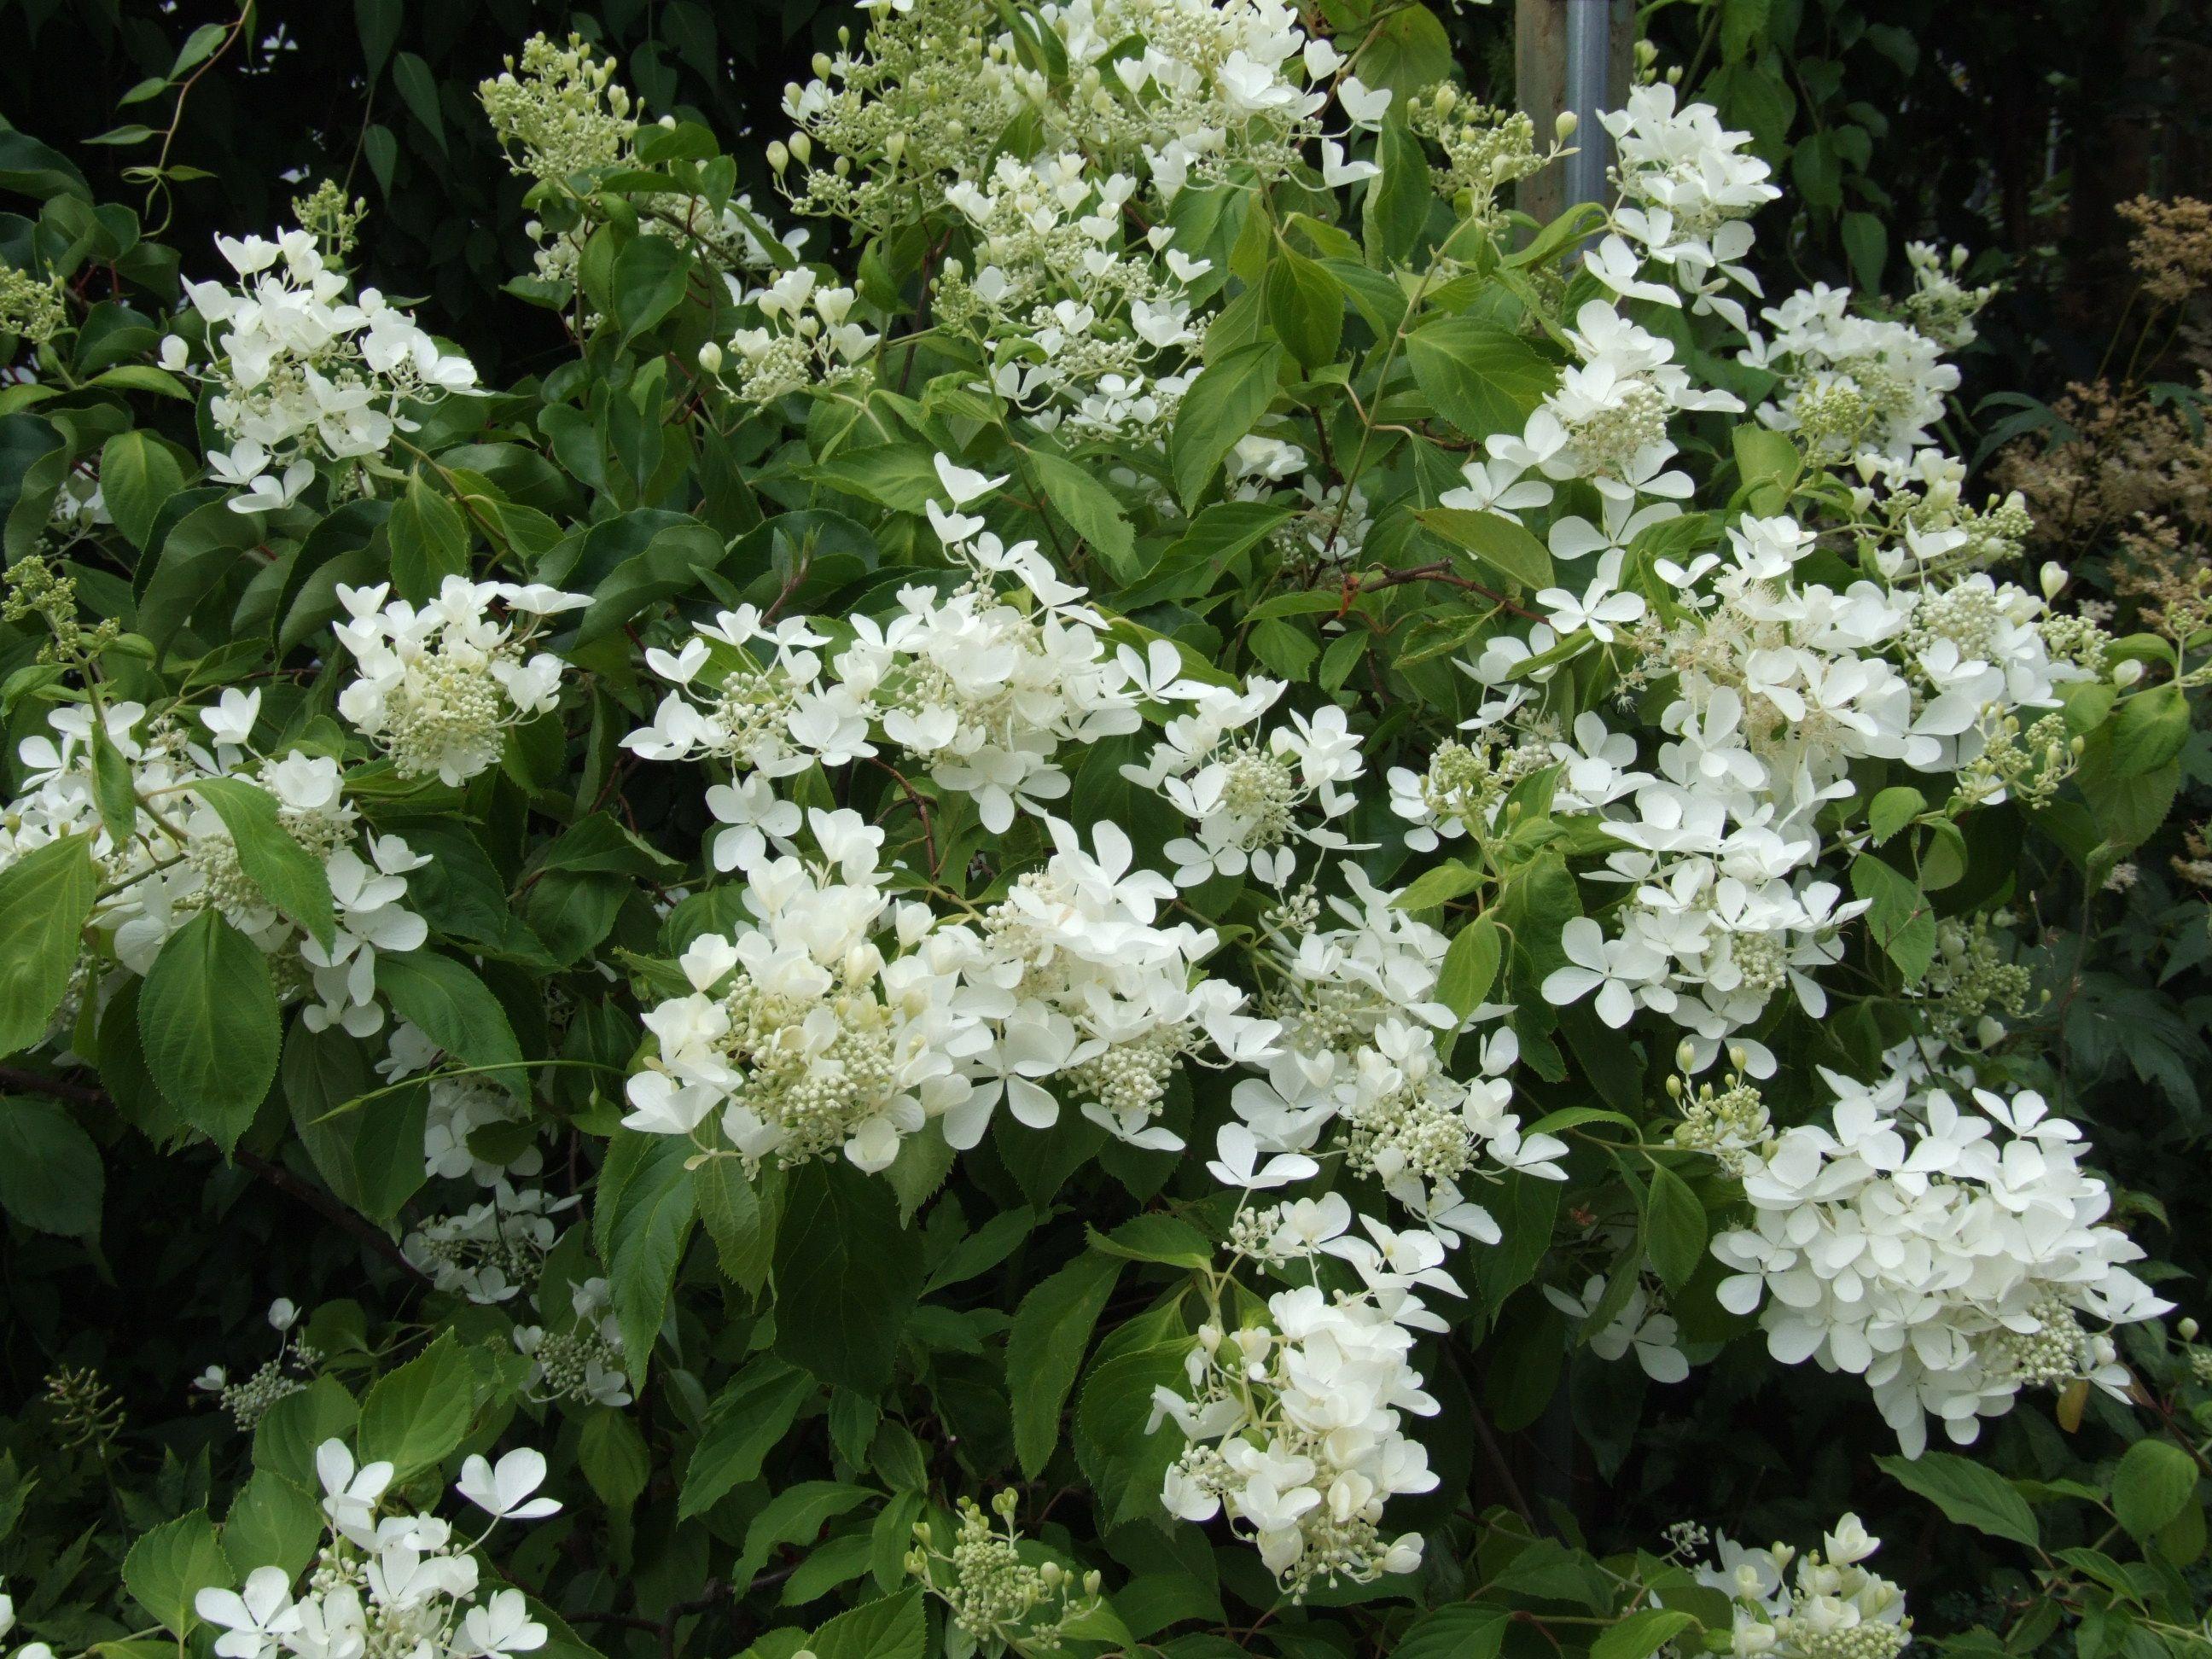 hydrangea paniculata u0027the swanu0027 shrubs - White Hydrangea